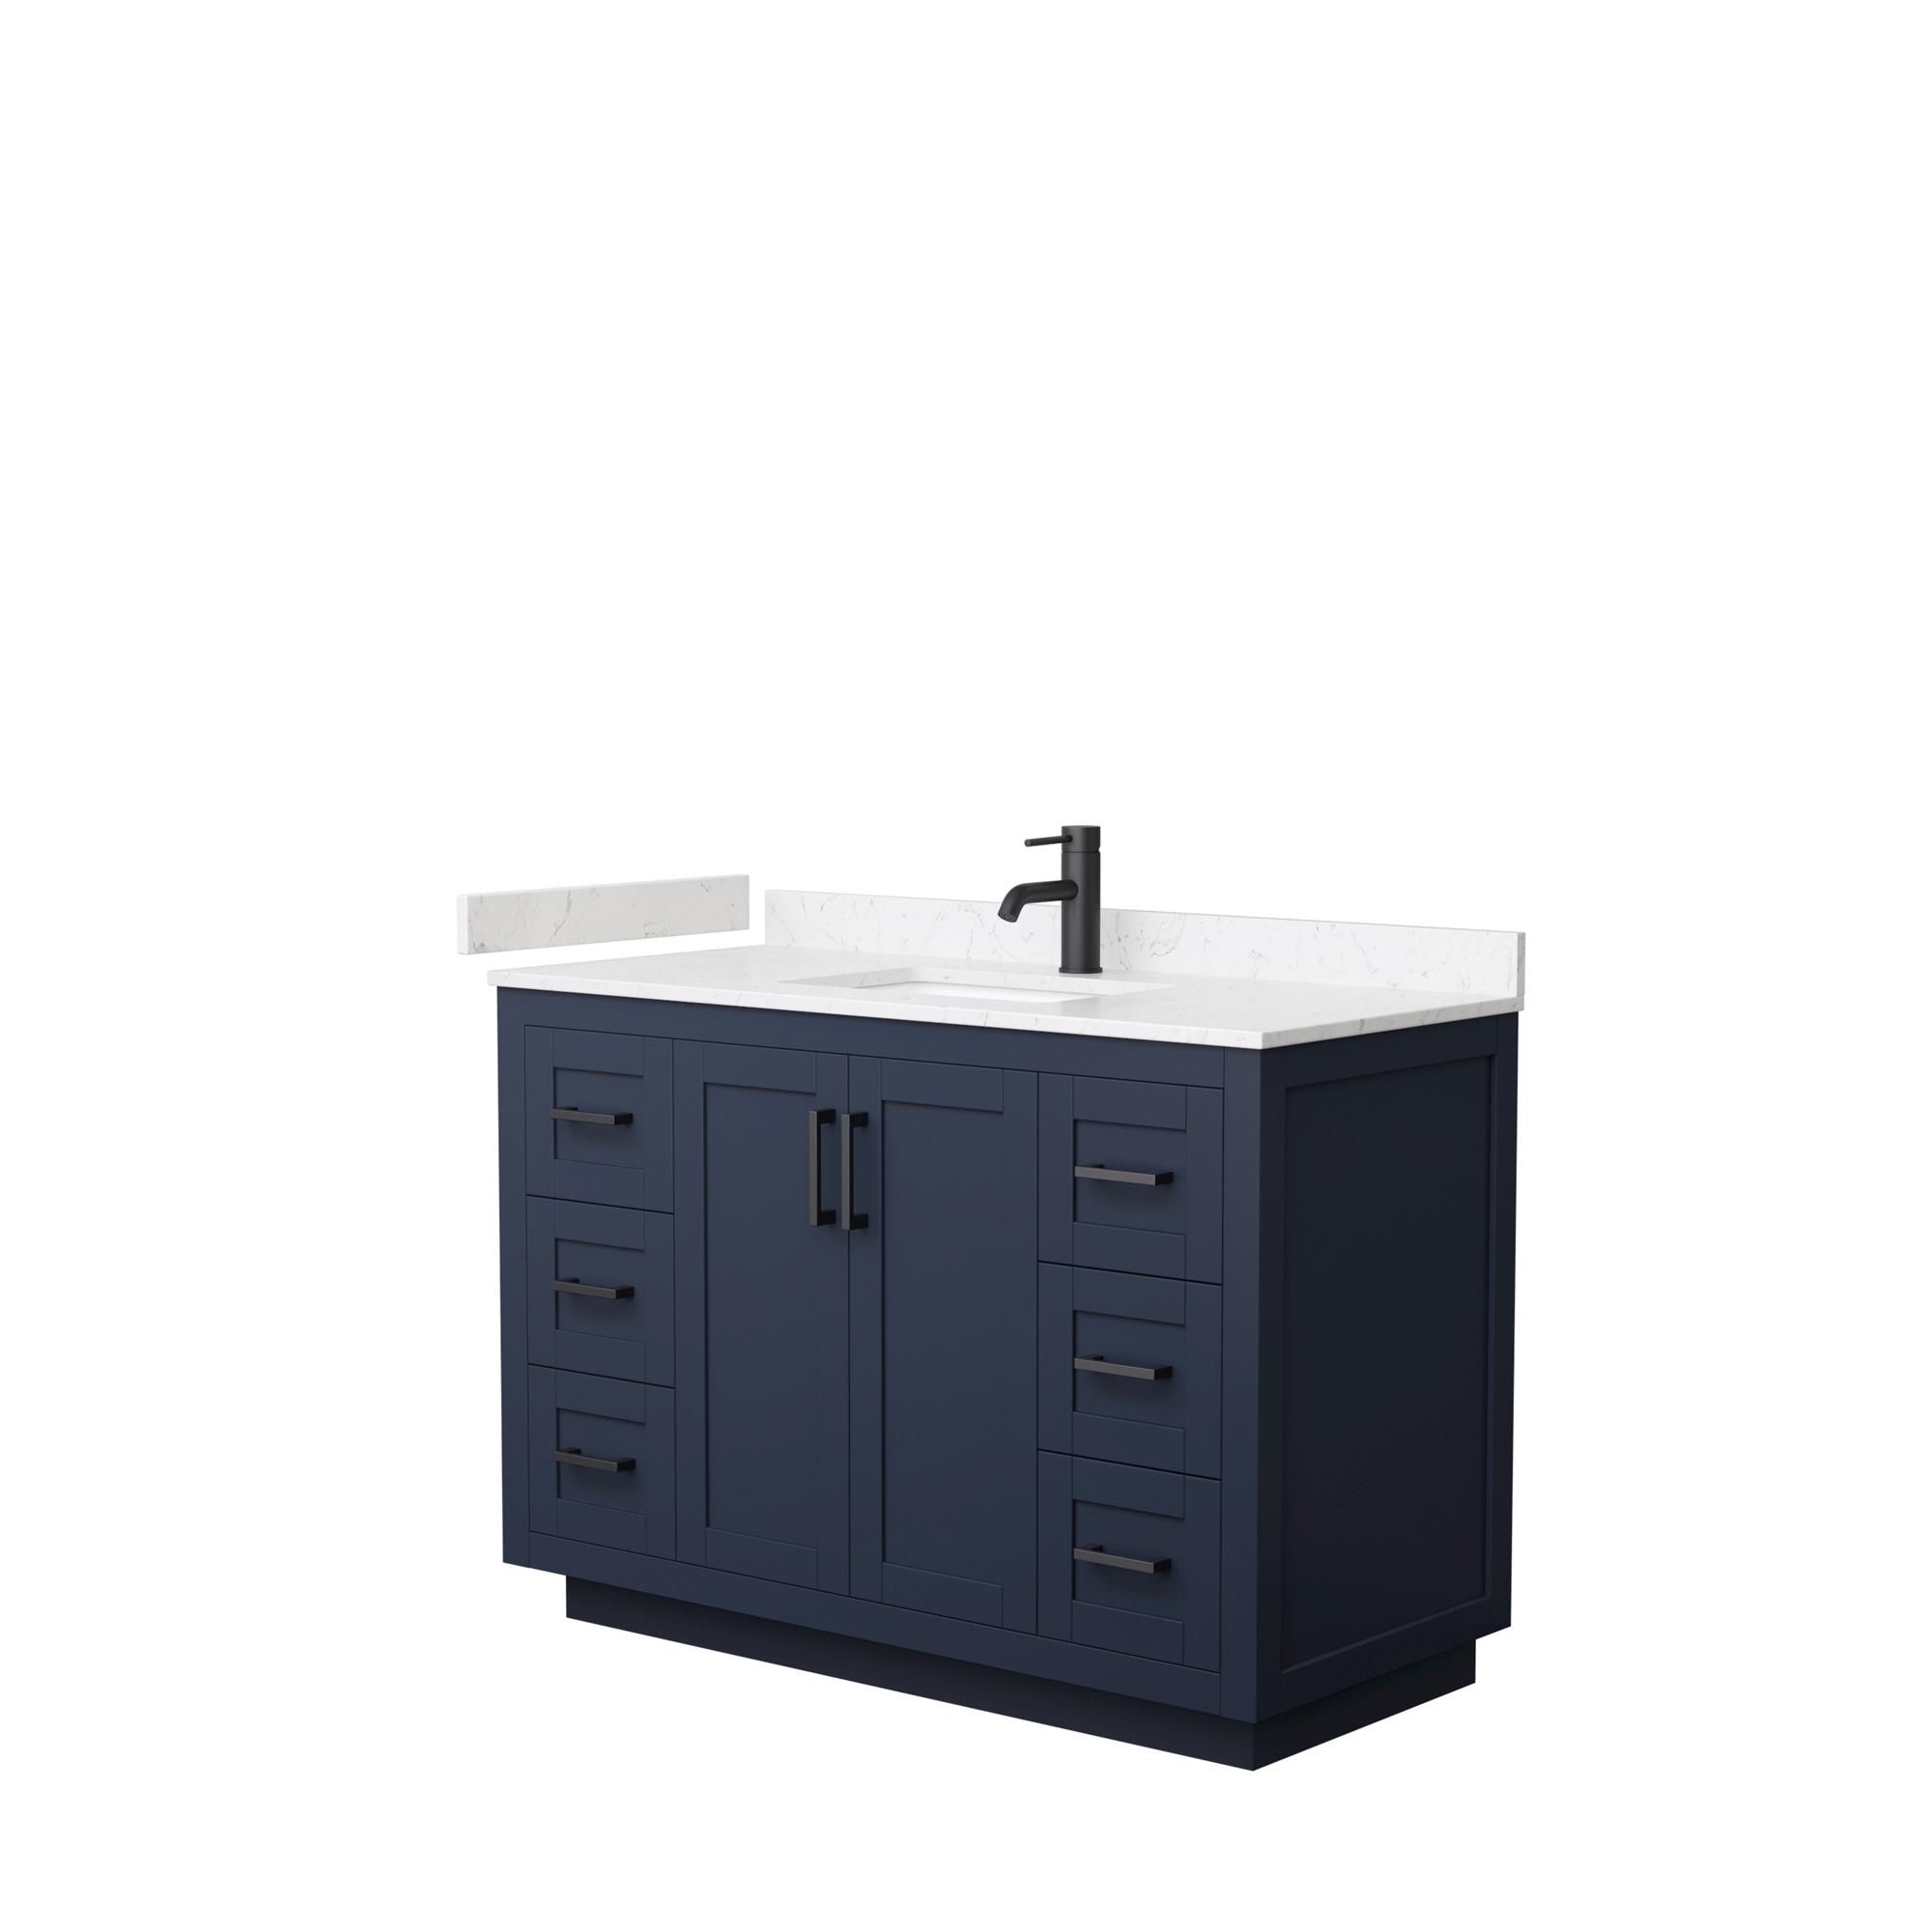 "48"" Single Bathroom Vanity in Dark Blue, Light-Vein Carrara Cultured Marble Countertop, Undermount Square Sink, Matte Black Trim"